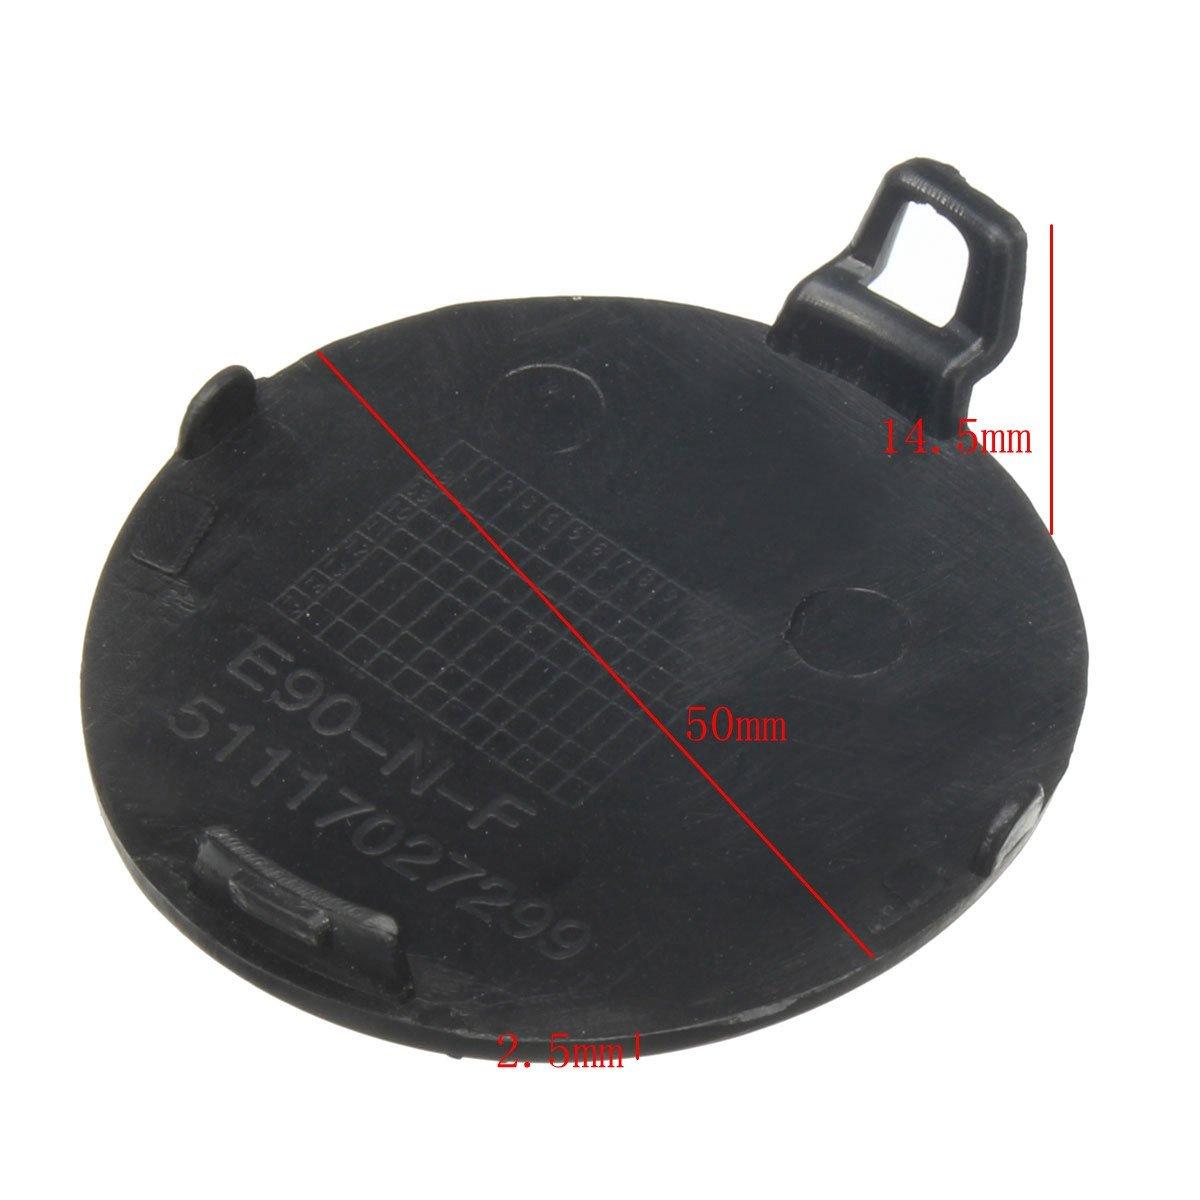 GOZAR Front Bumper Tow Hook Cover Cap Black For BMW E90 E91 316i 318i 320i 328i 330i